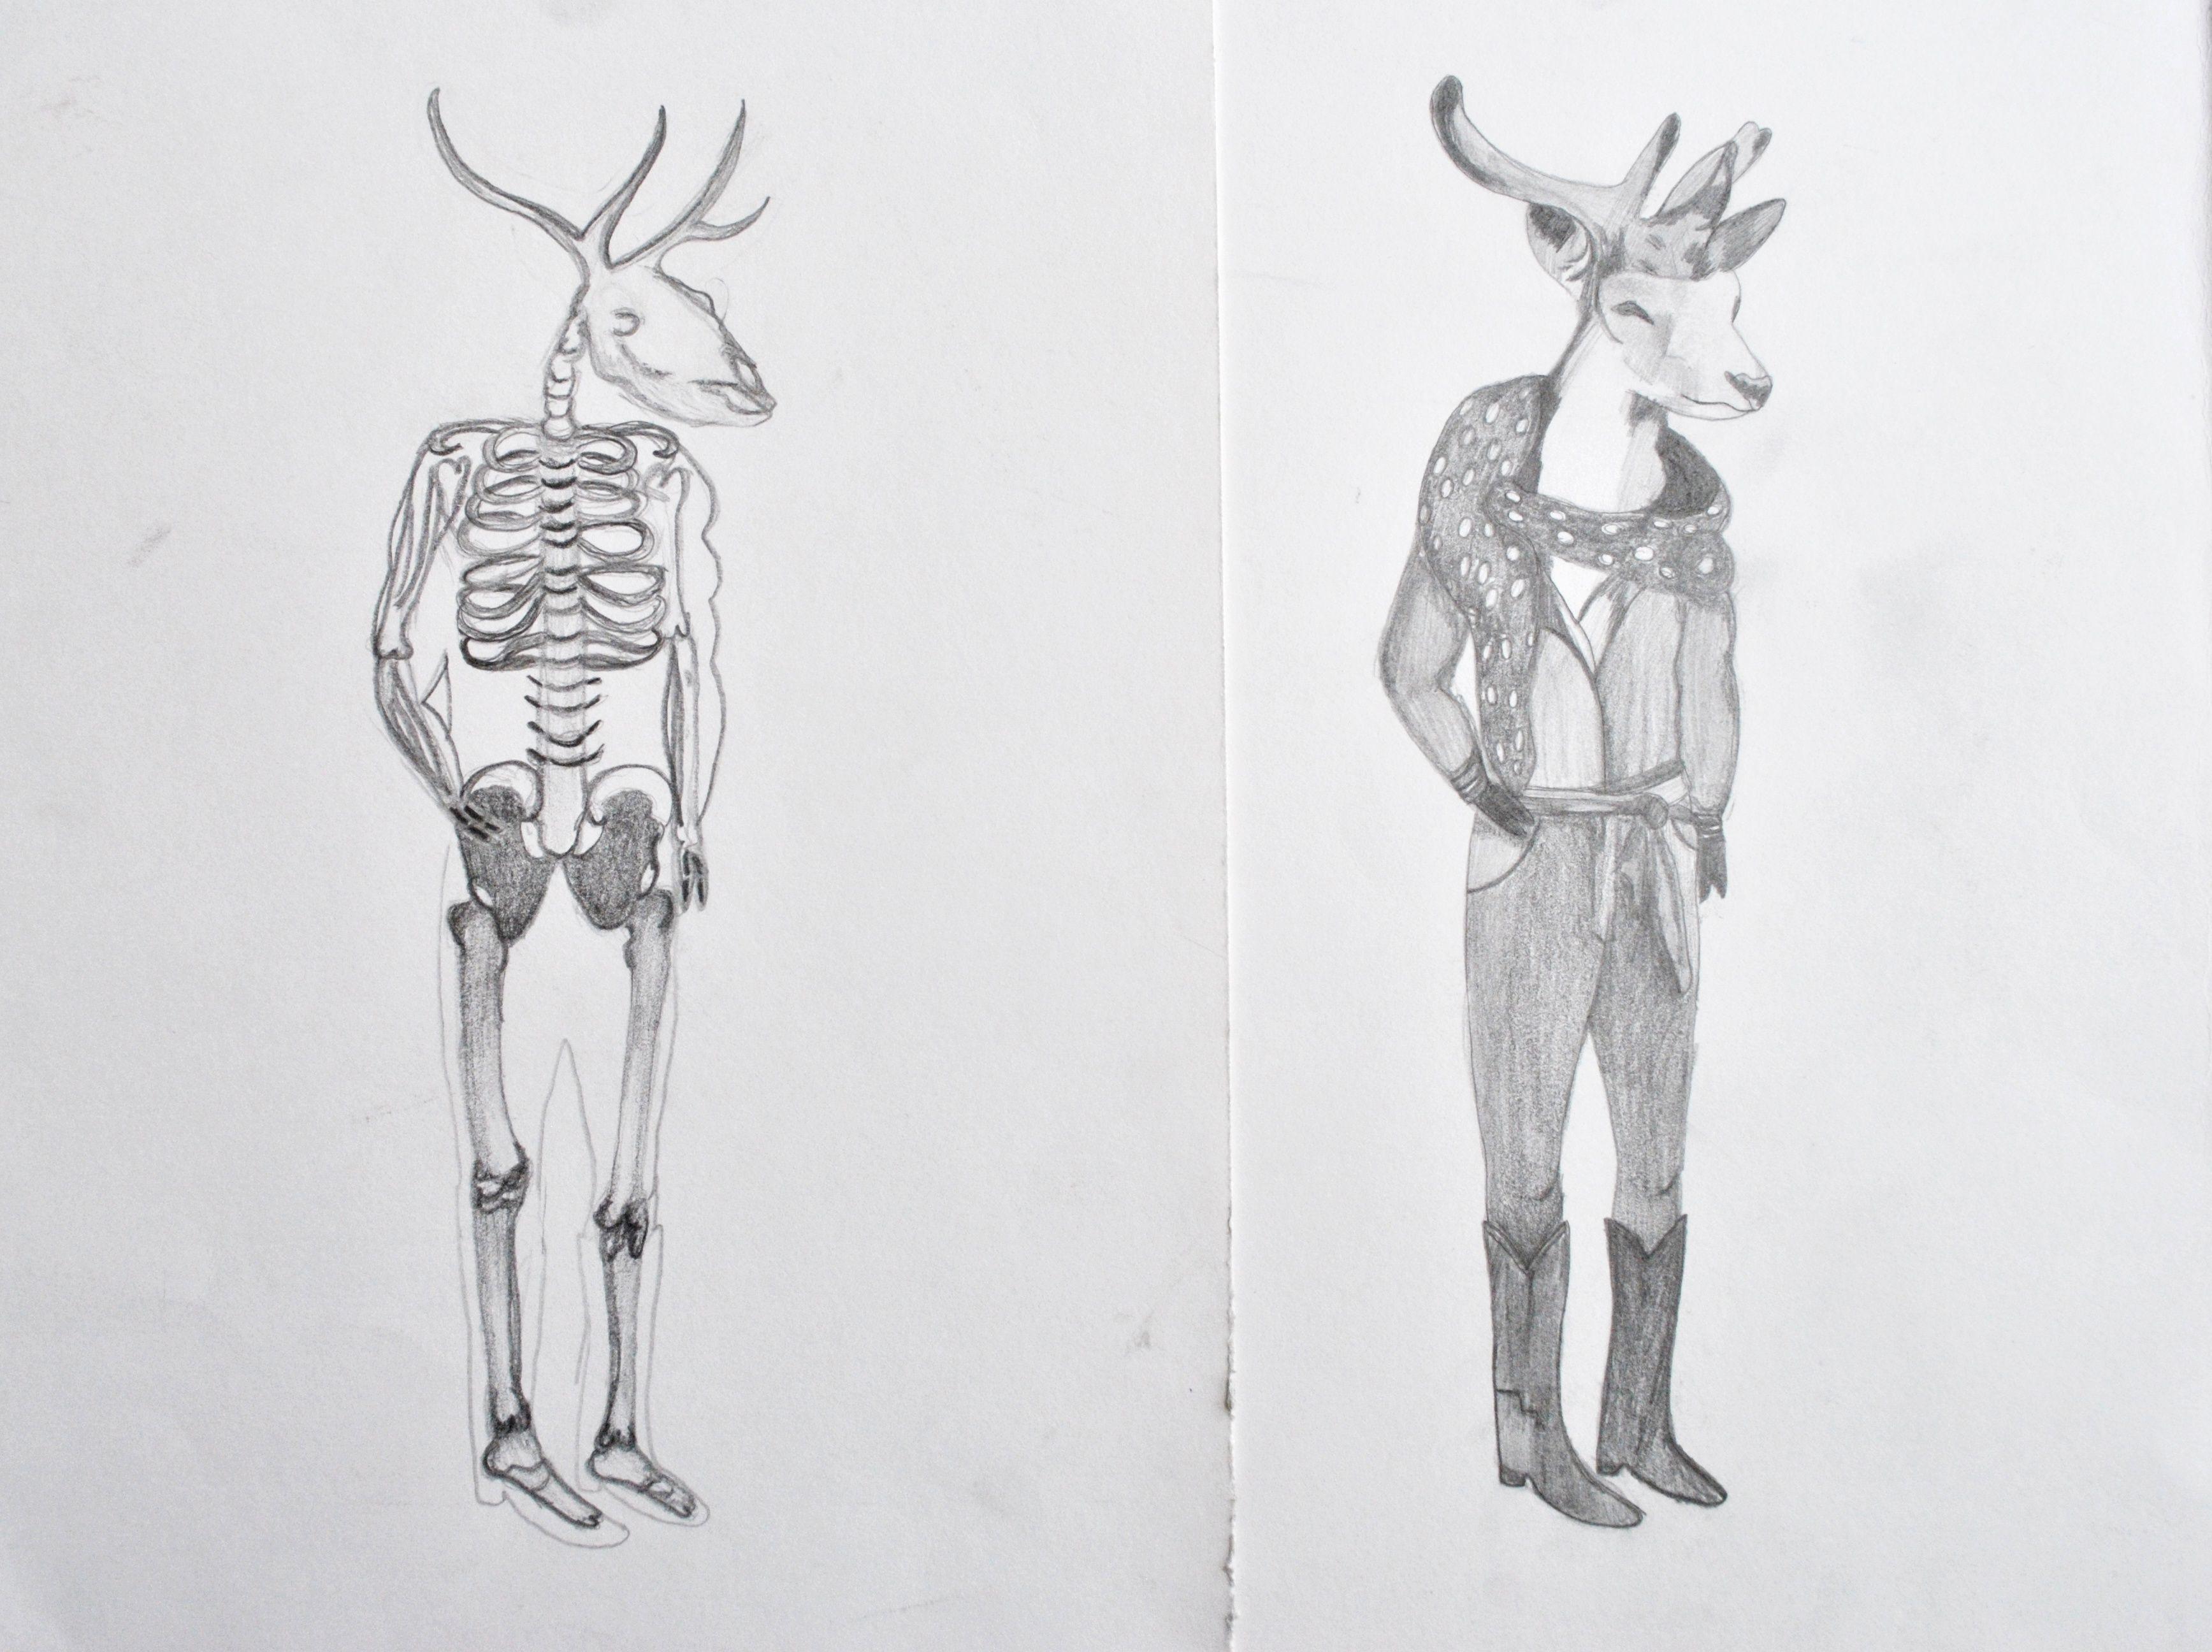 Half Man Half Animal Grayscale Pencil Exercise